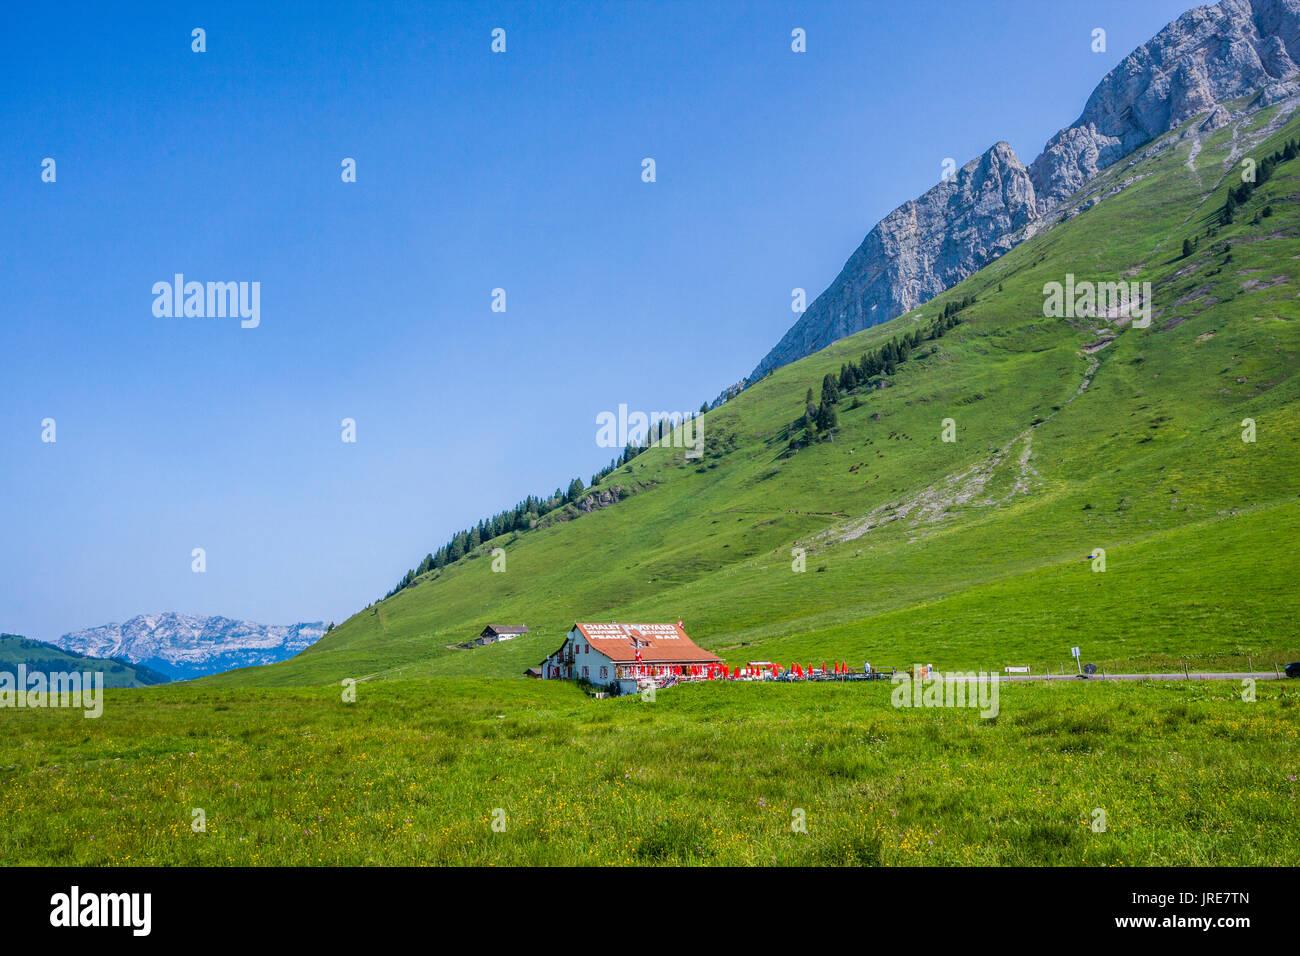 France, Haute-Savoie/Savoie, French Alps; Chalet Savoyard restaurant at the Col de Aravis mountain Pass - Stock Image